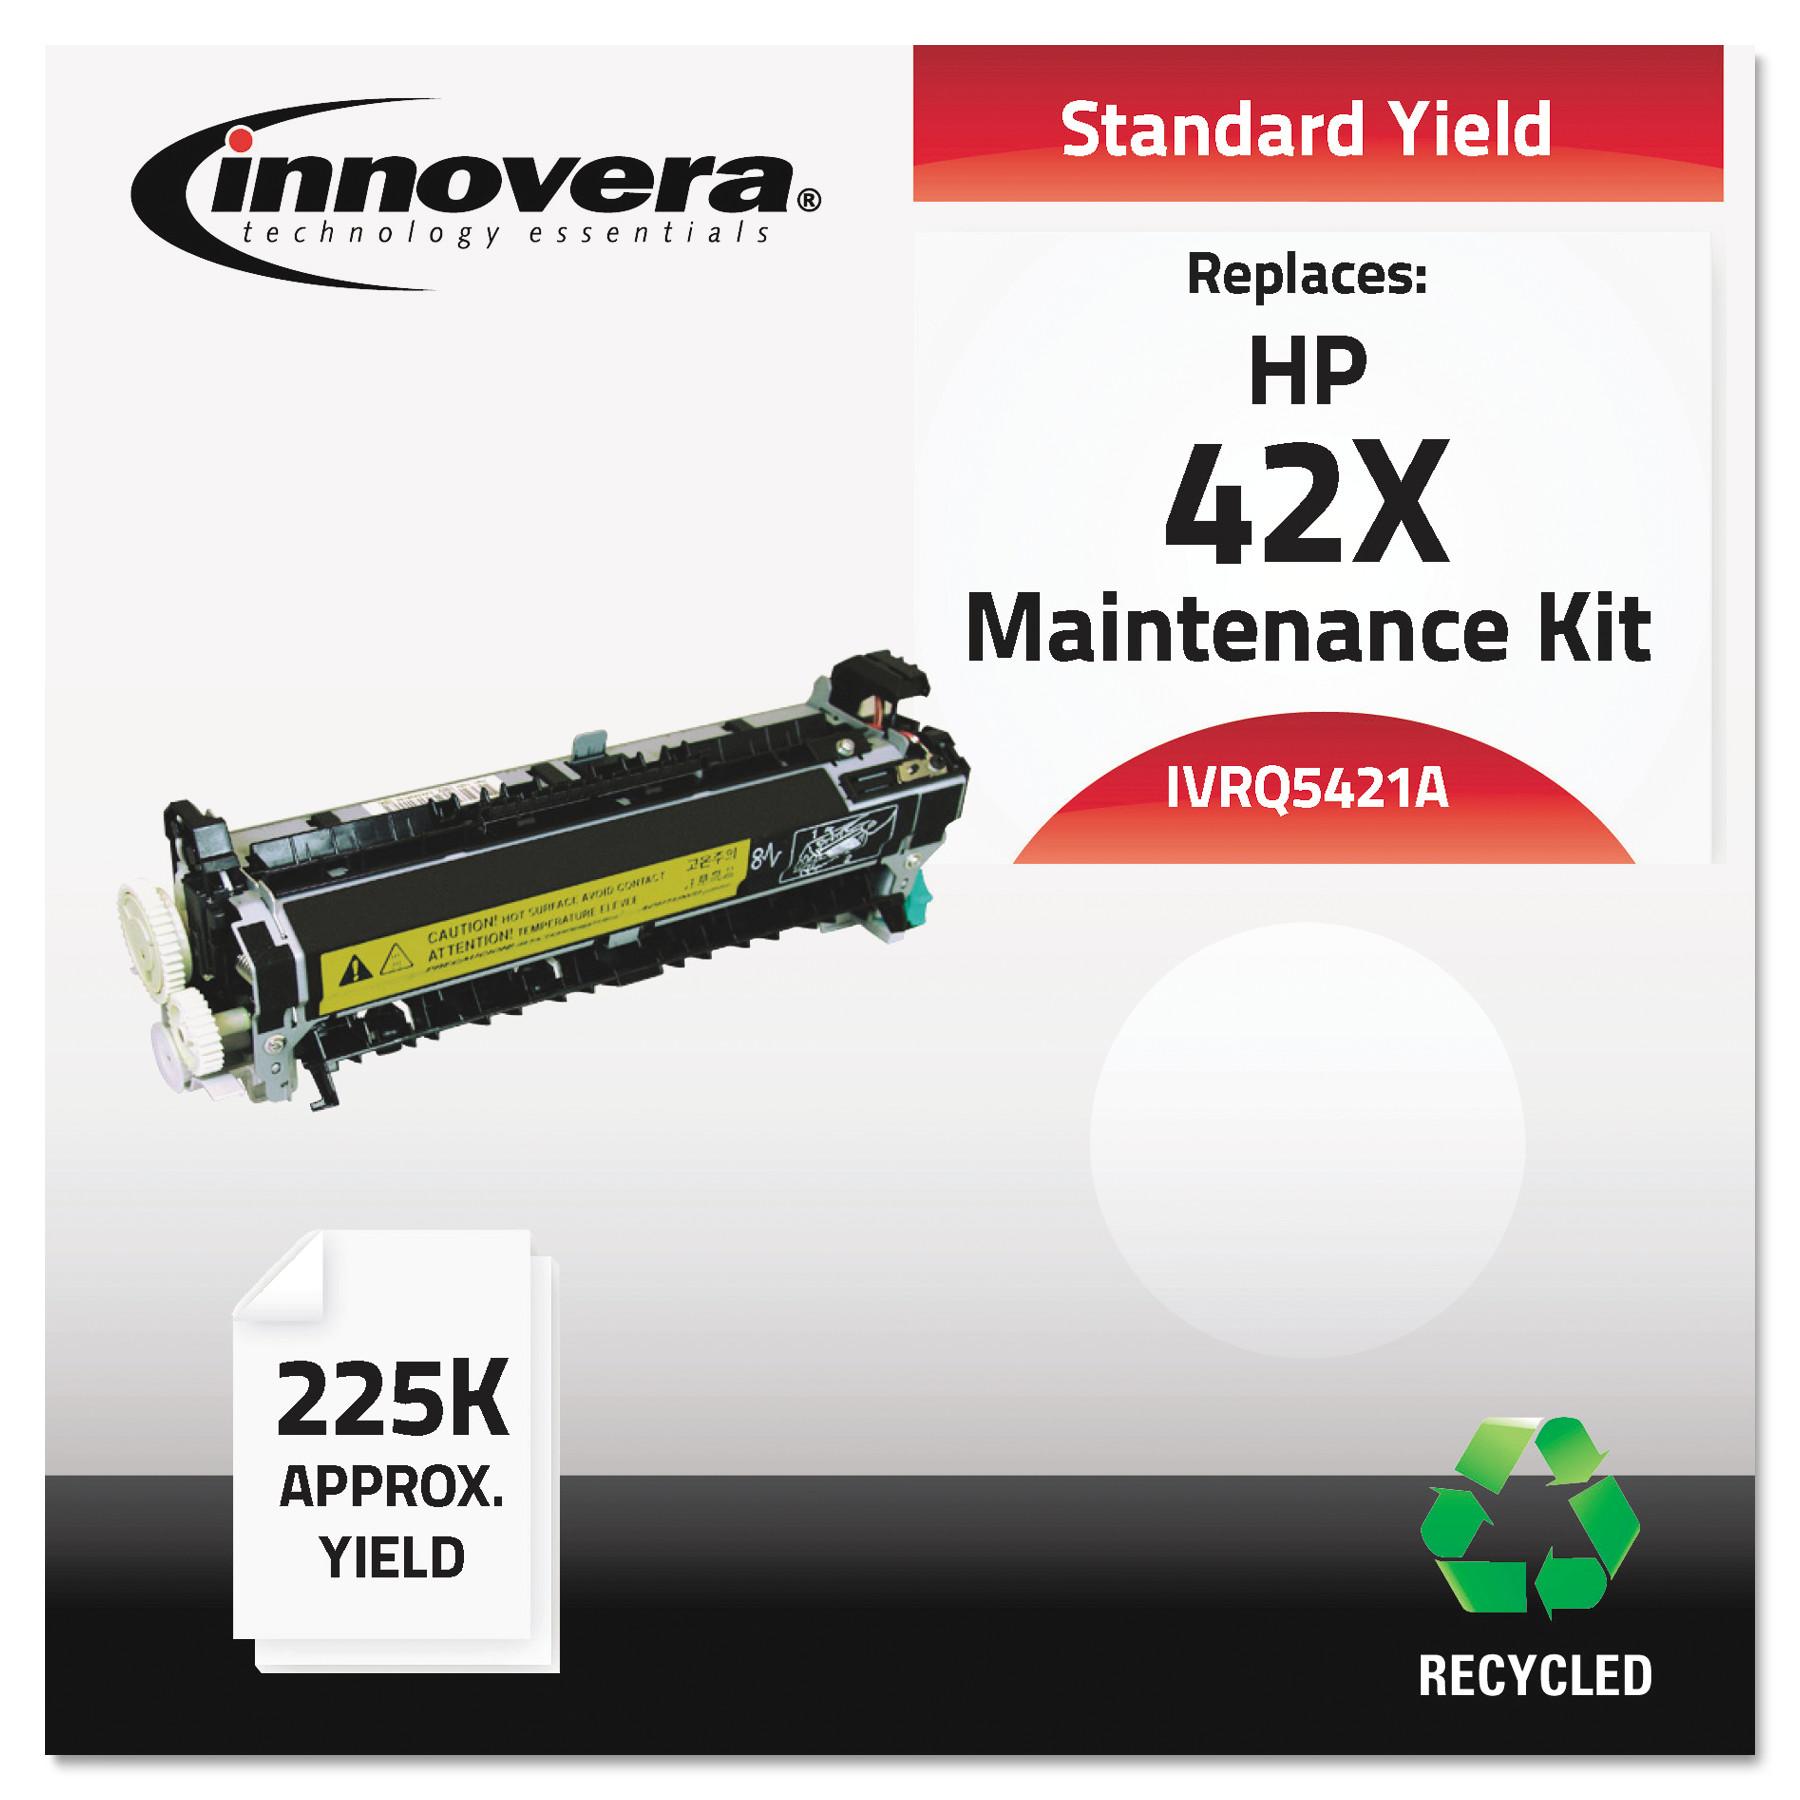 Innovera Remanufactured Q5421A (4250) Maintenance Kit